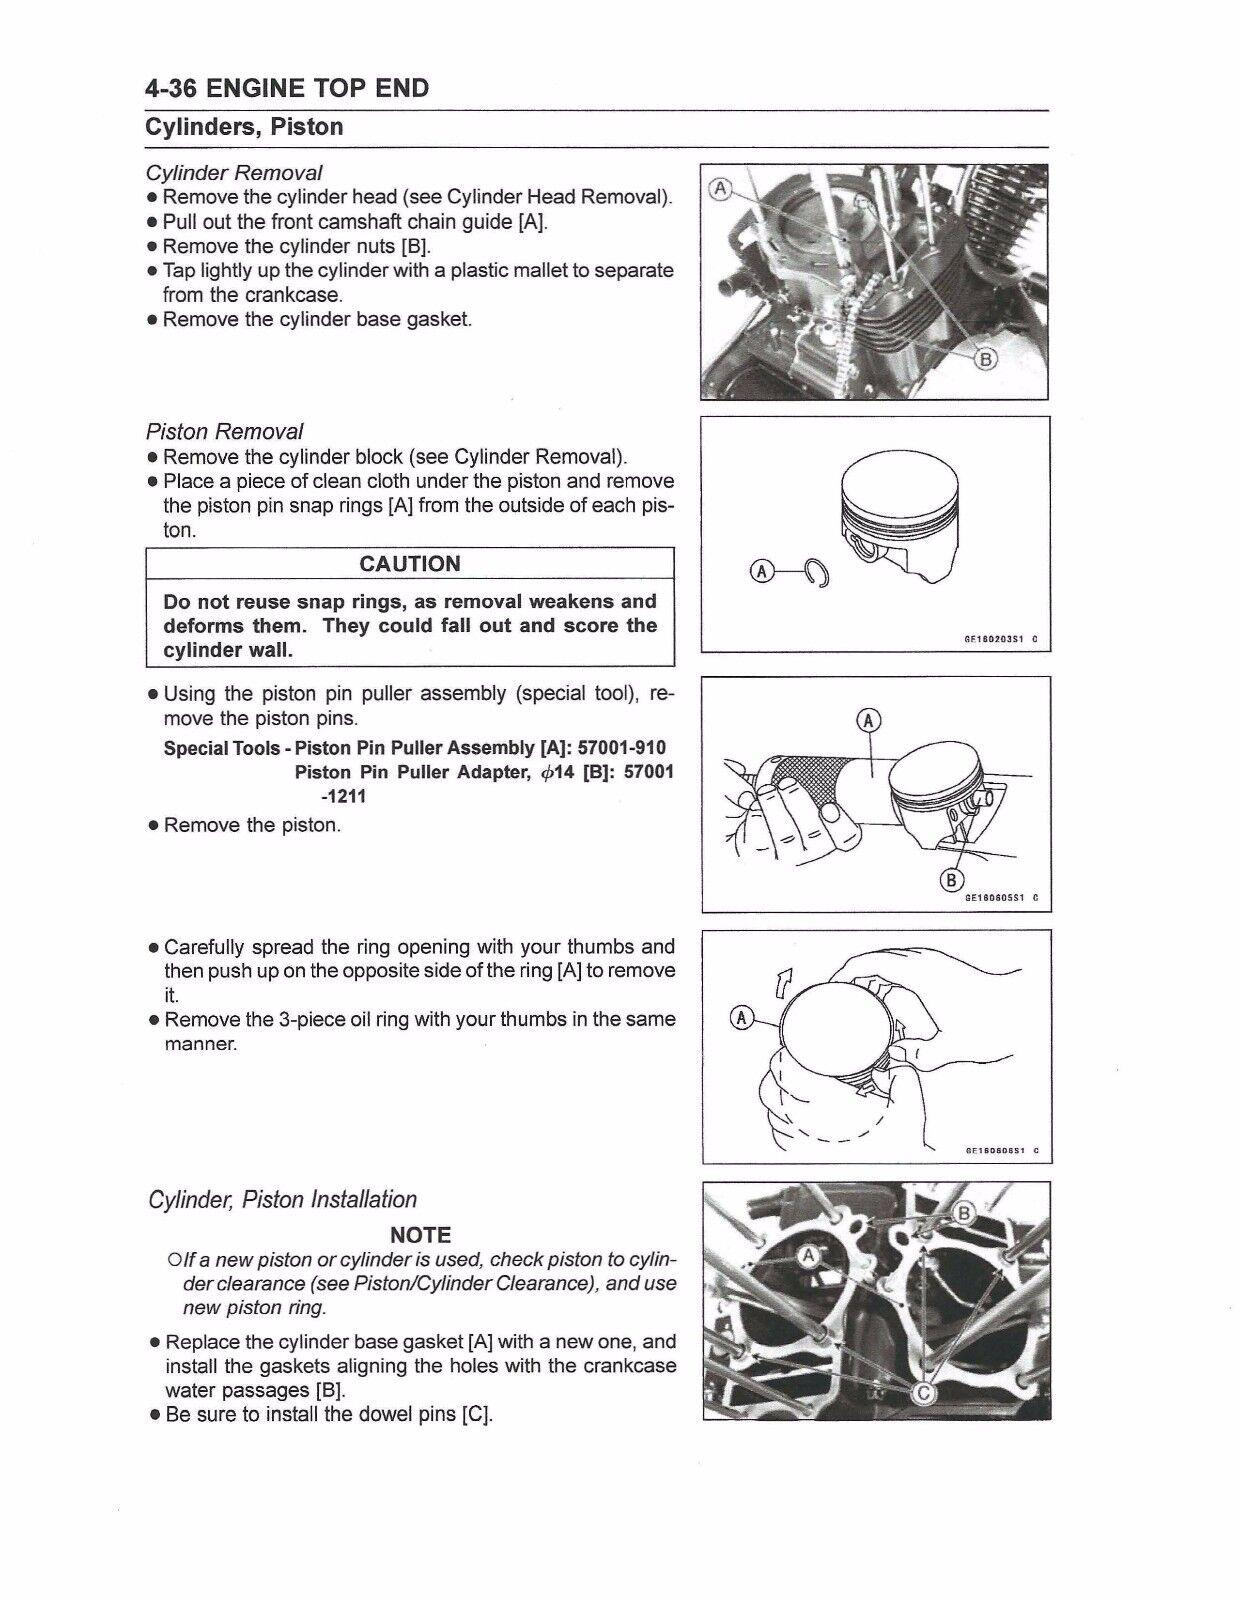 Kawasaki Service Manual 2006 Vulcan 1500 Classic Fi Vn 2000 Vn1500 Wiring Schematic 8 Of 12 9